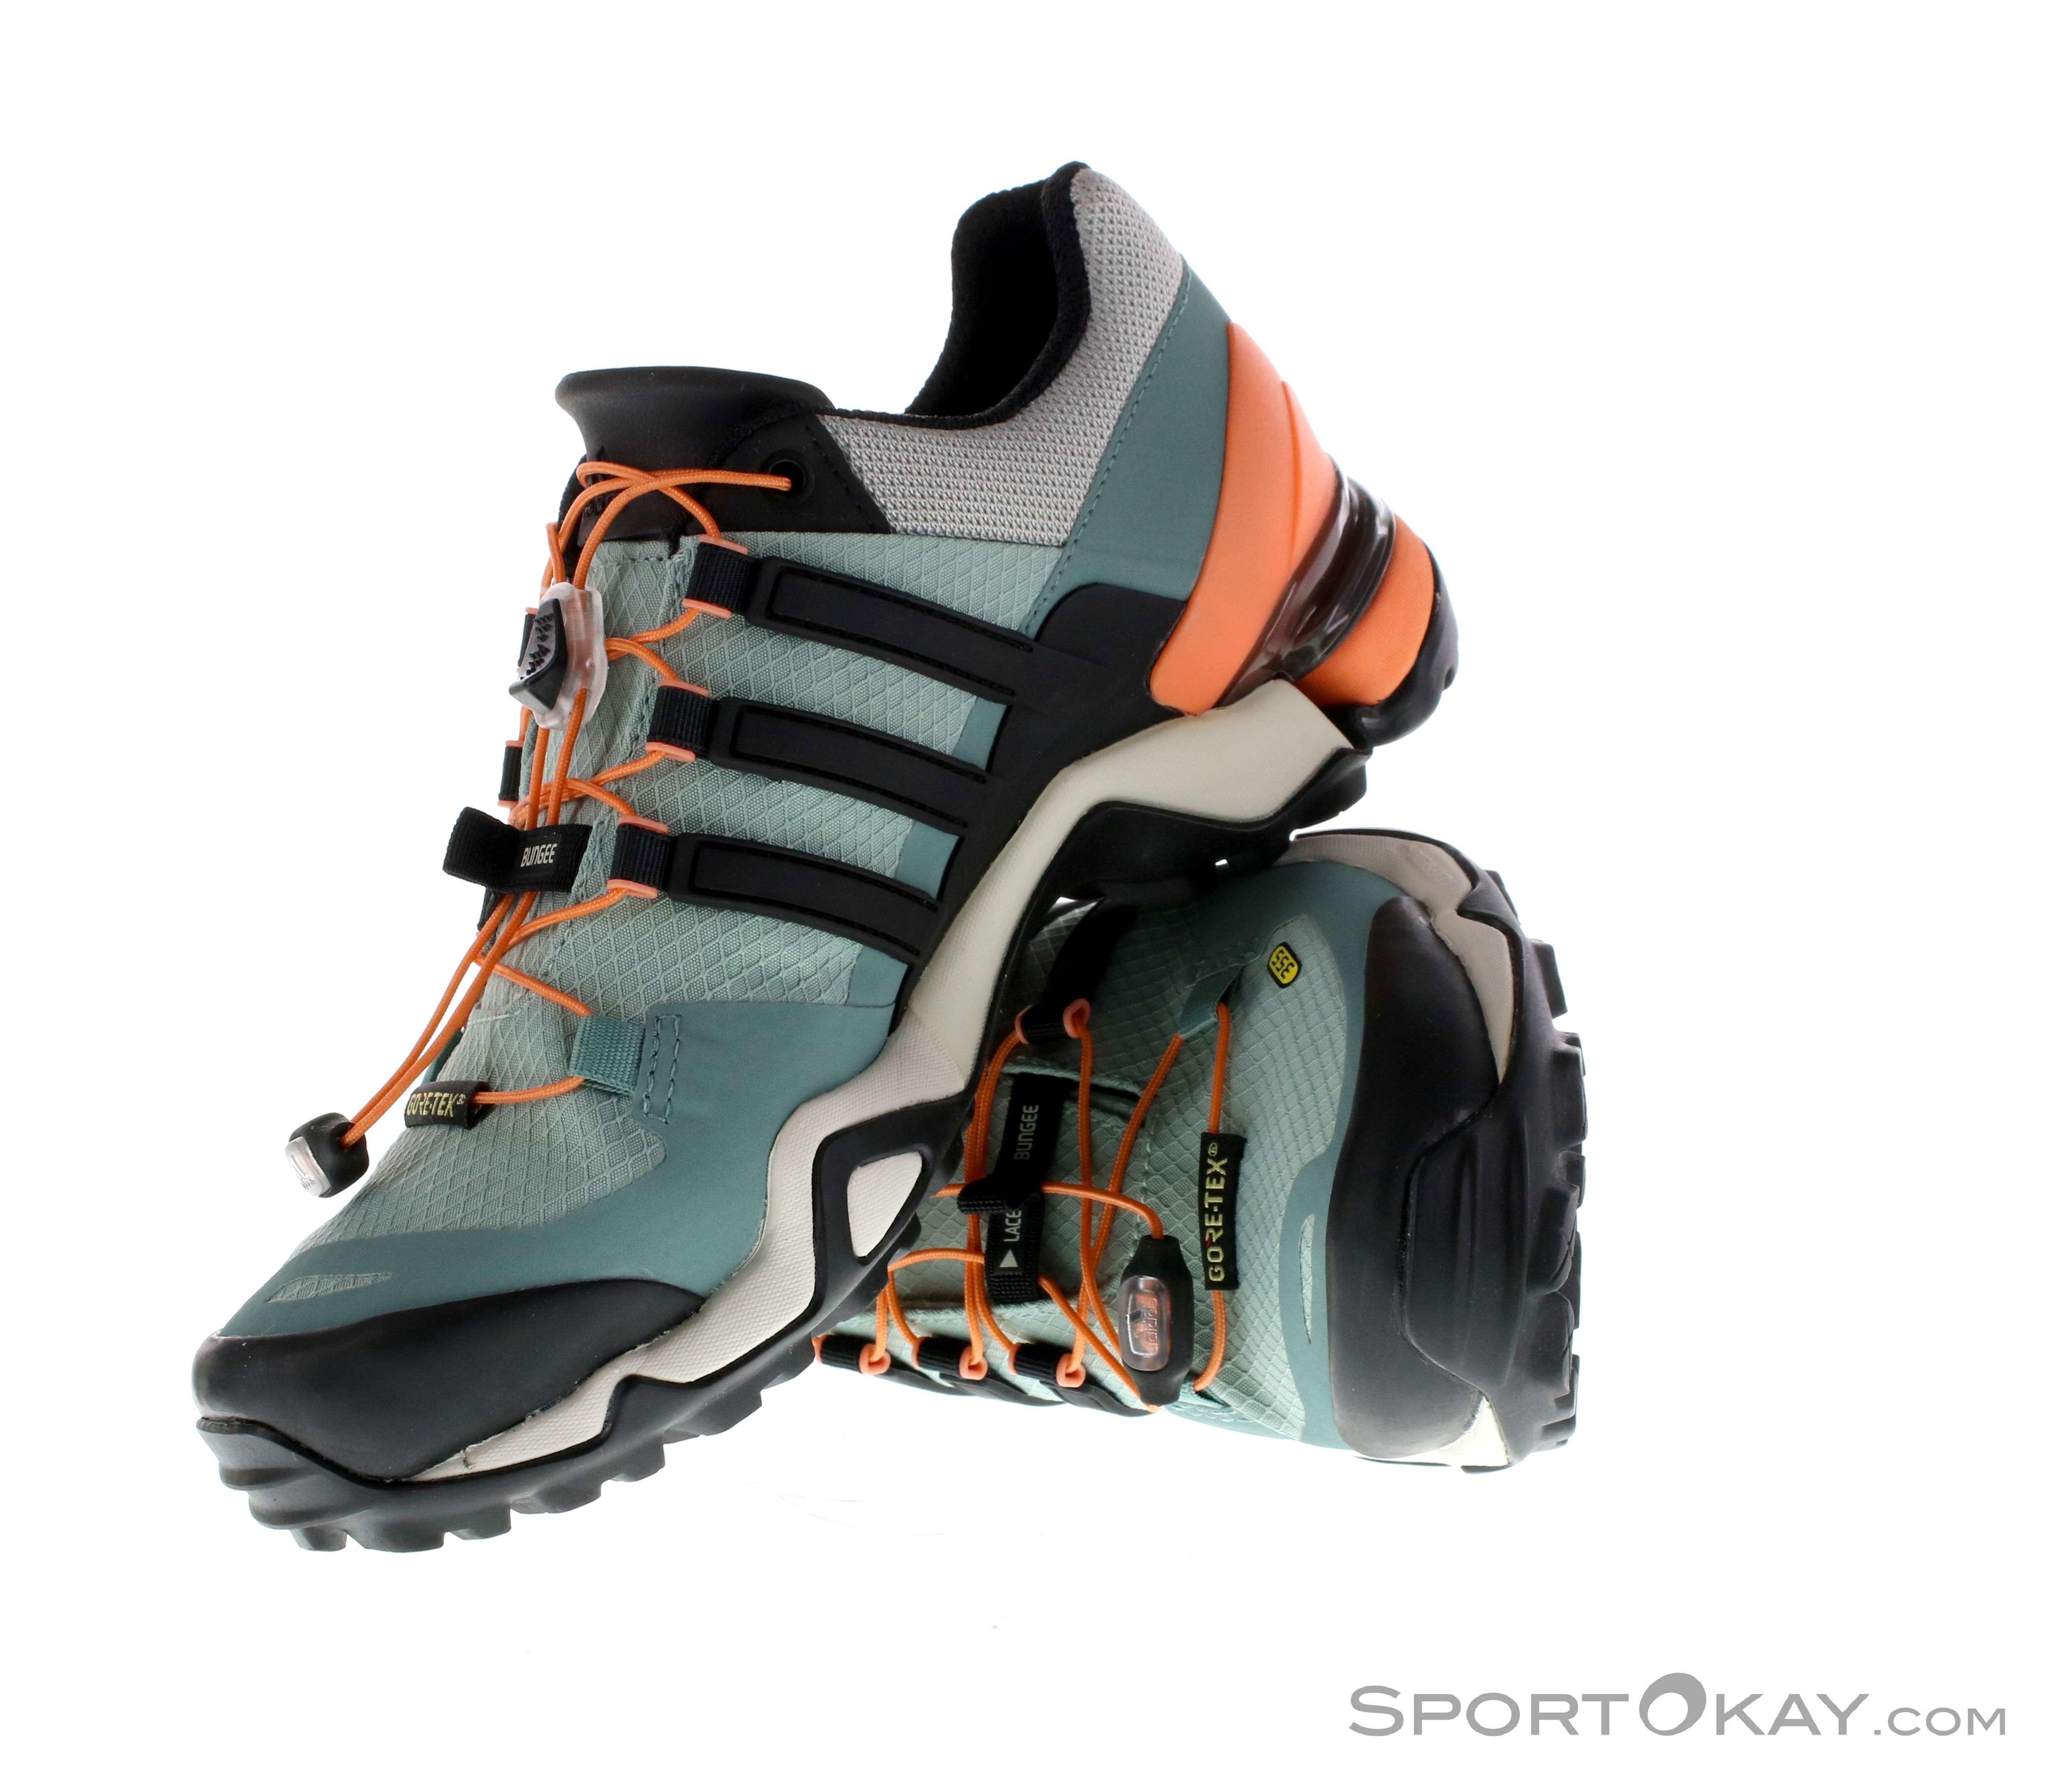 59cb7df2d adidas Terrex Fast R GTX Womens Outdoor Shoes Gore-Tex - Trekking ...